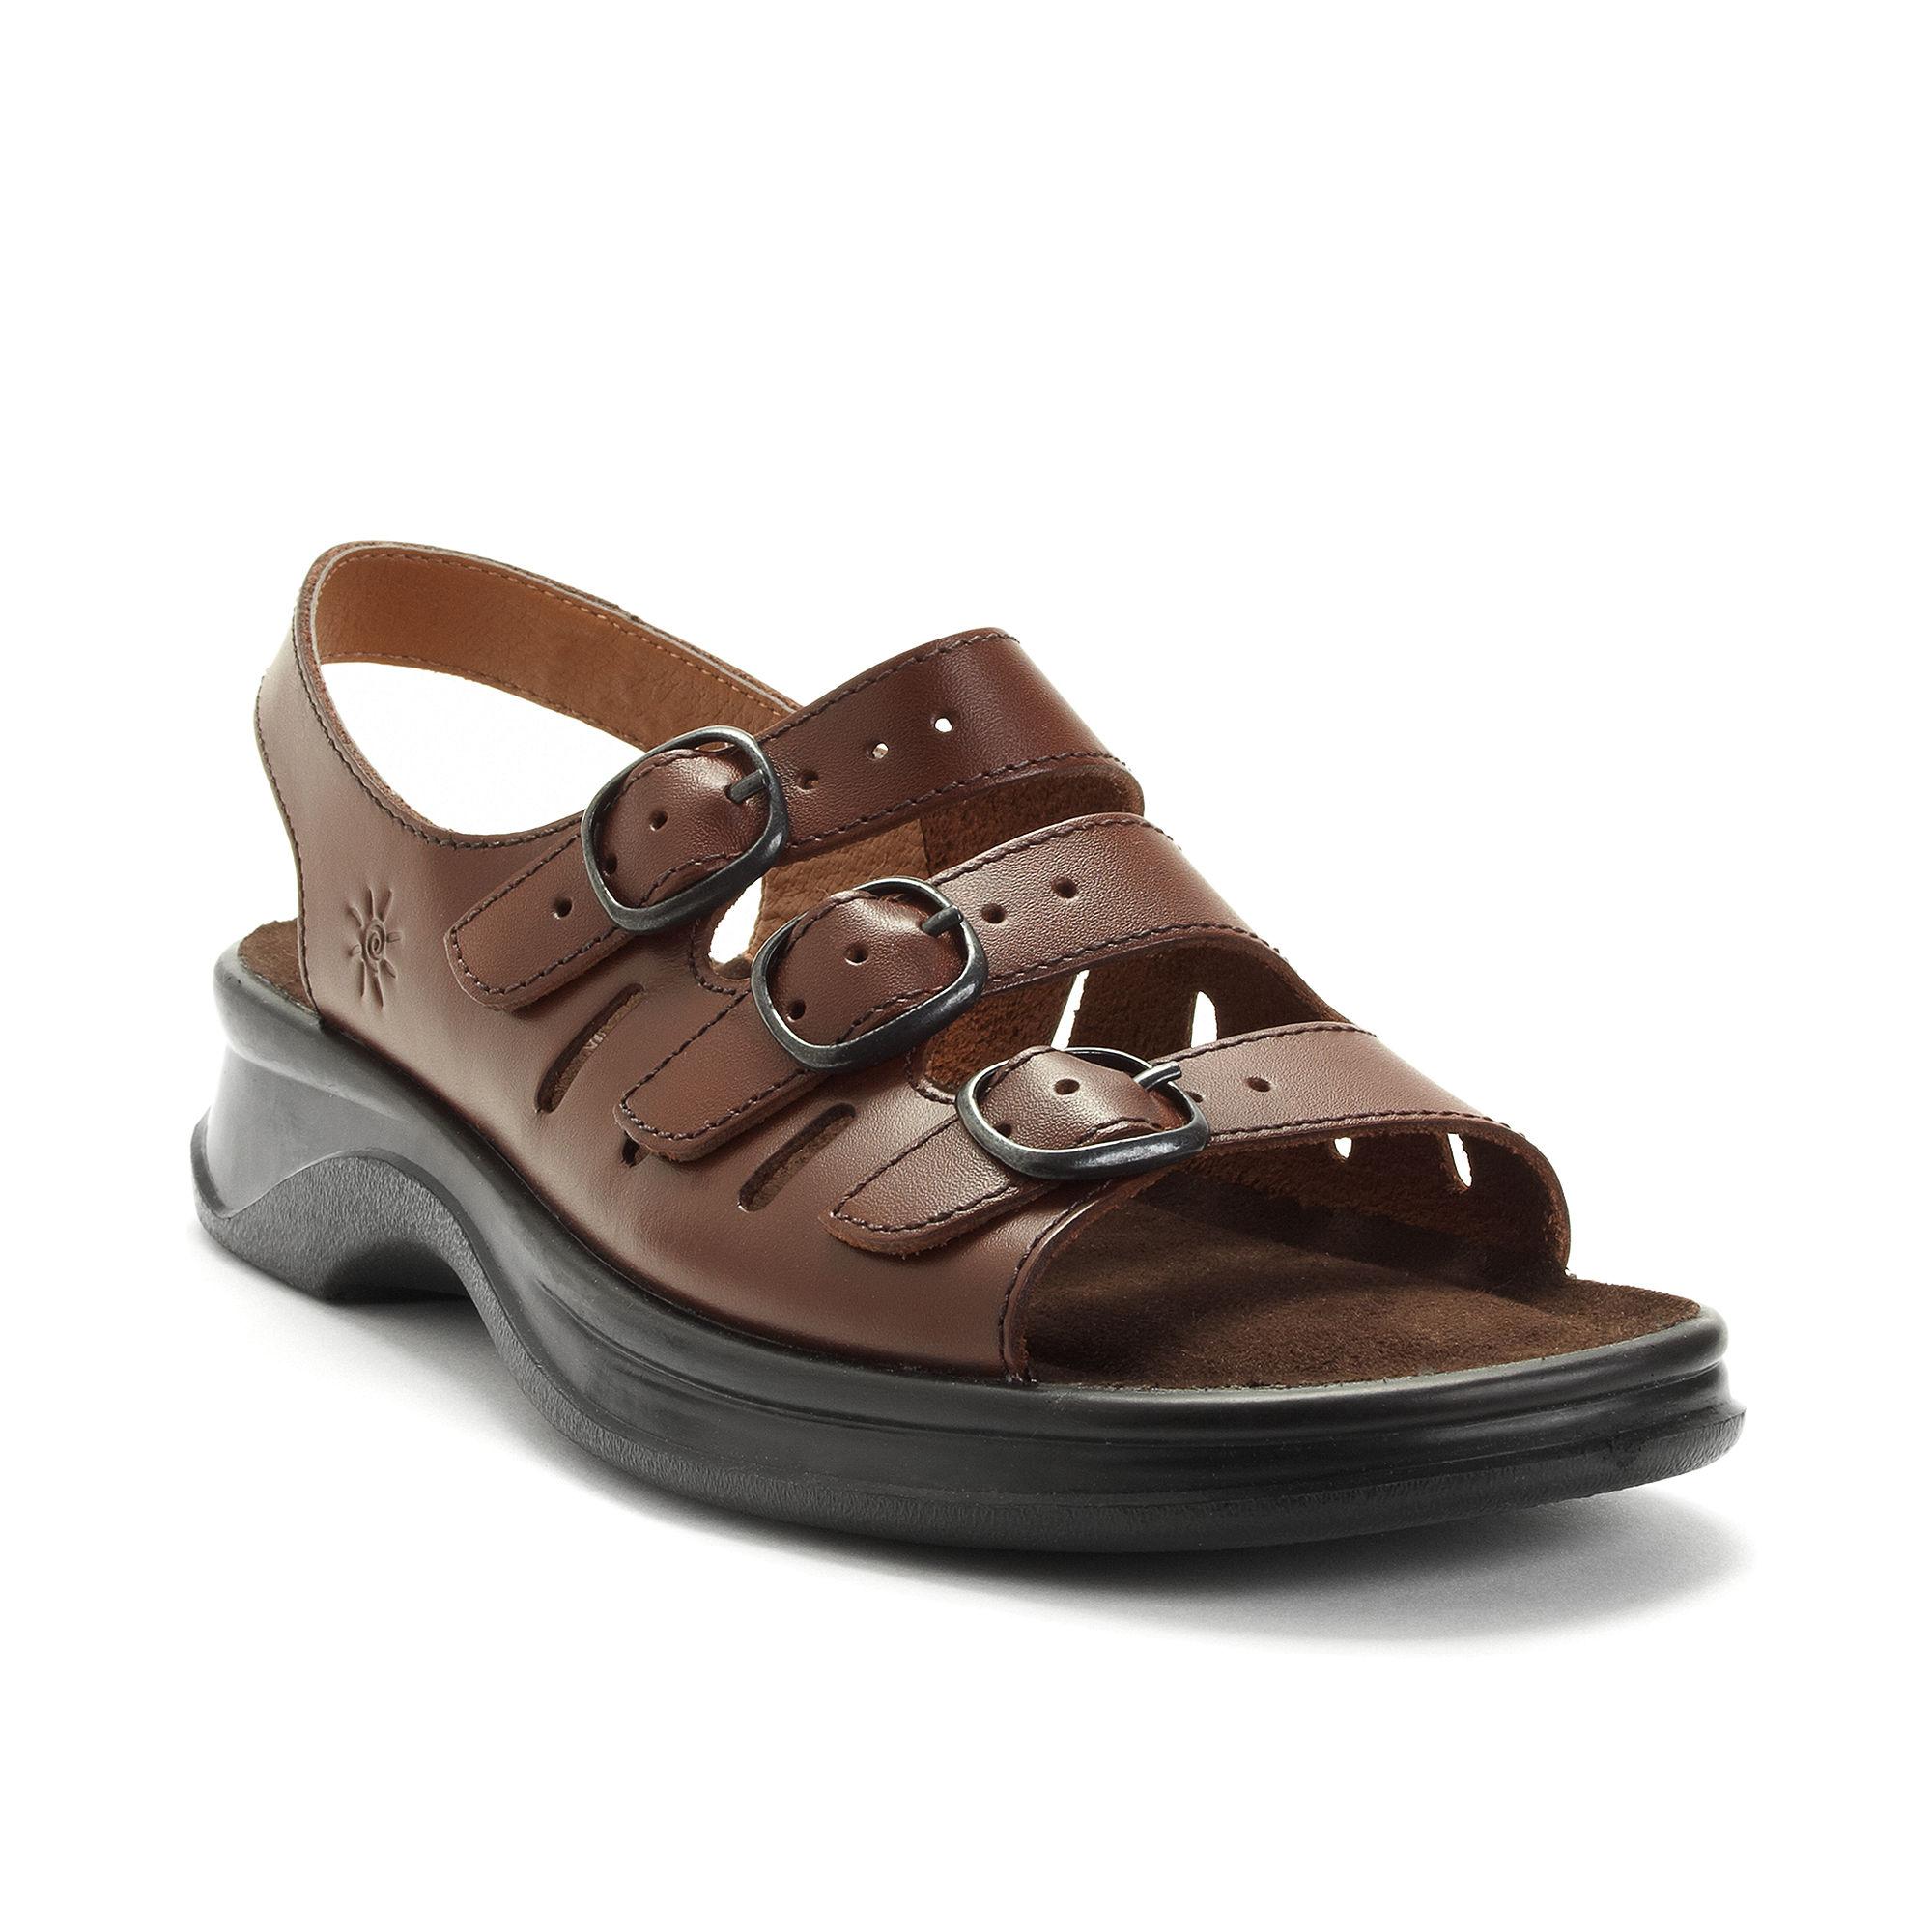 71272d4b8400c Lyst - Clarks Sunbeat Sandals in Brown